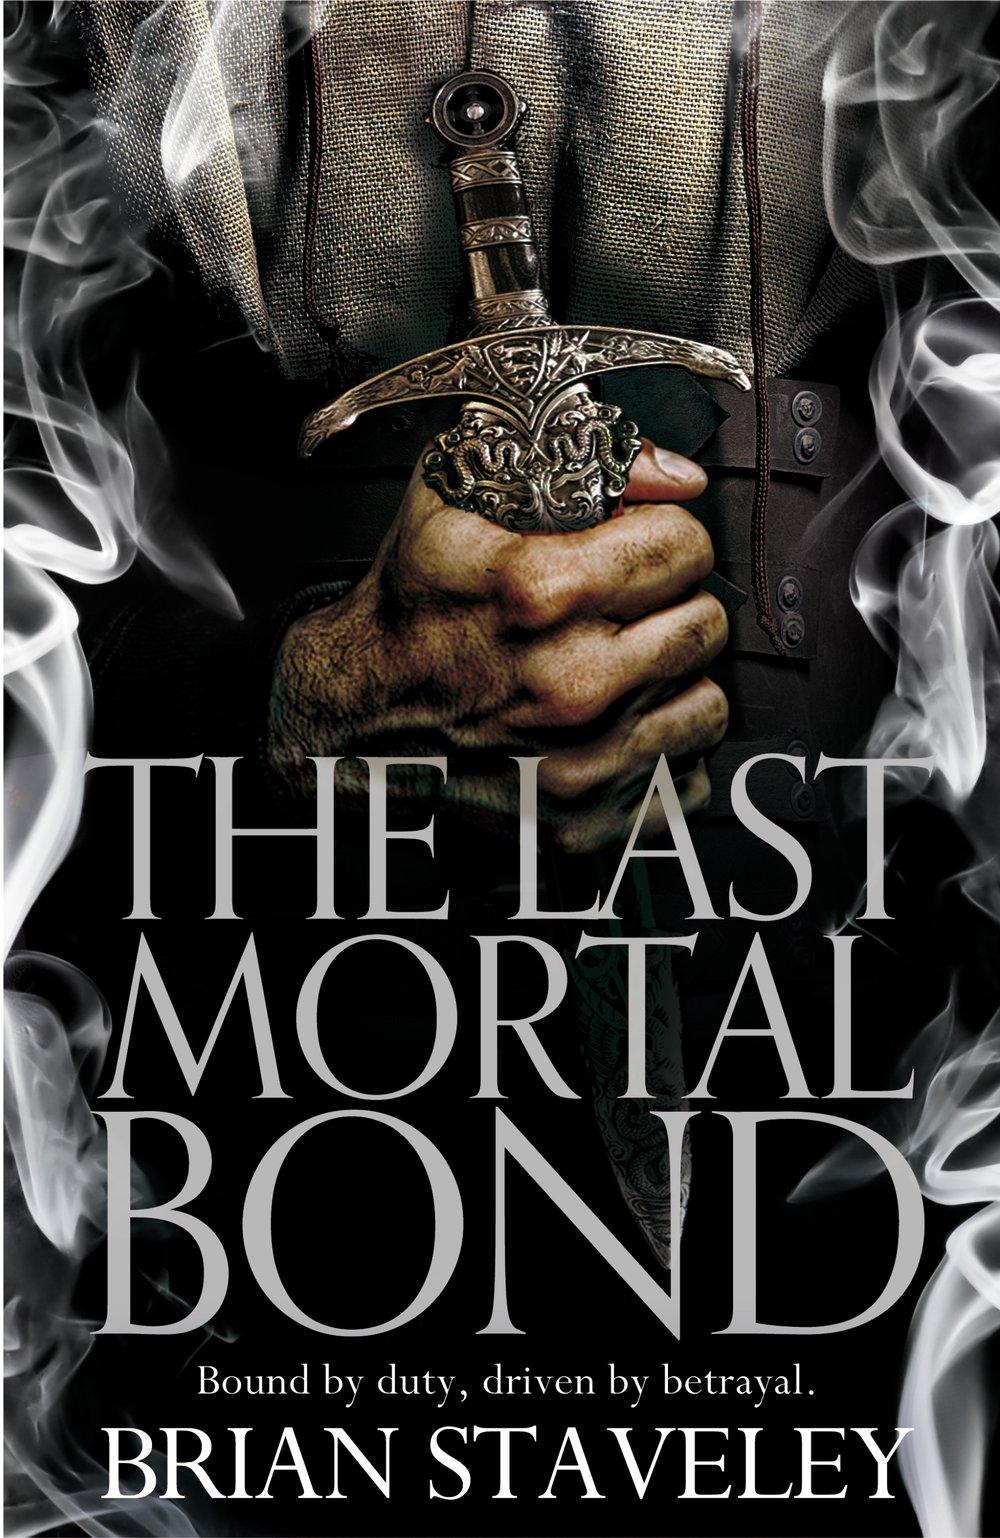 9781447235835The Last Mortal Bond.jpg